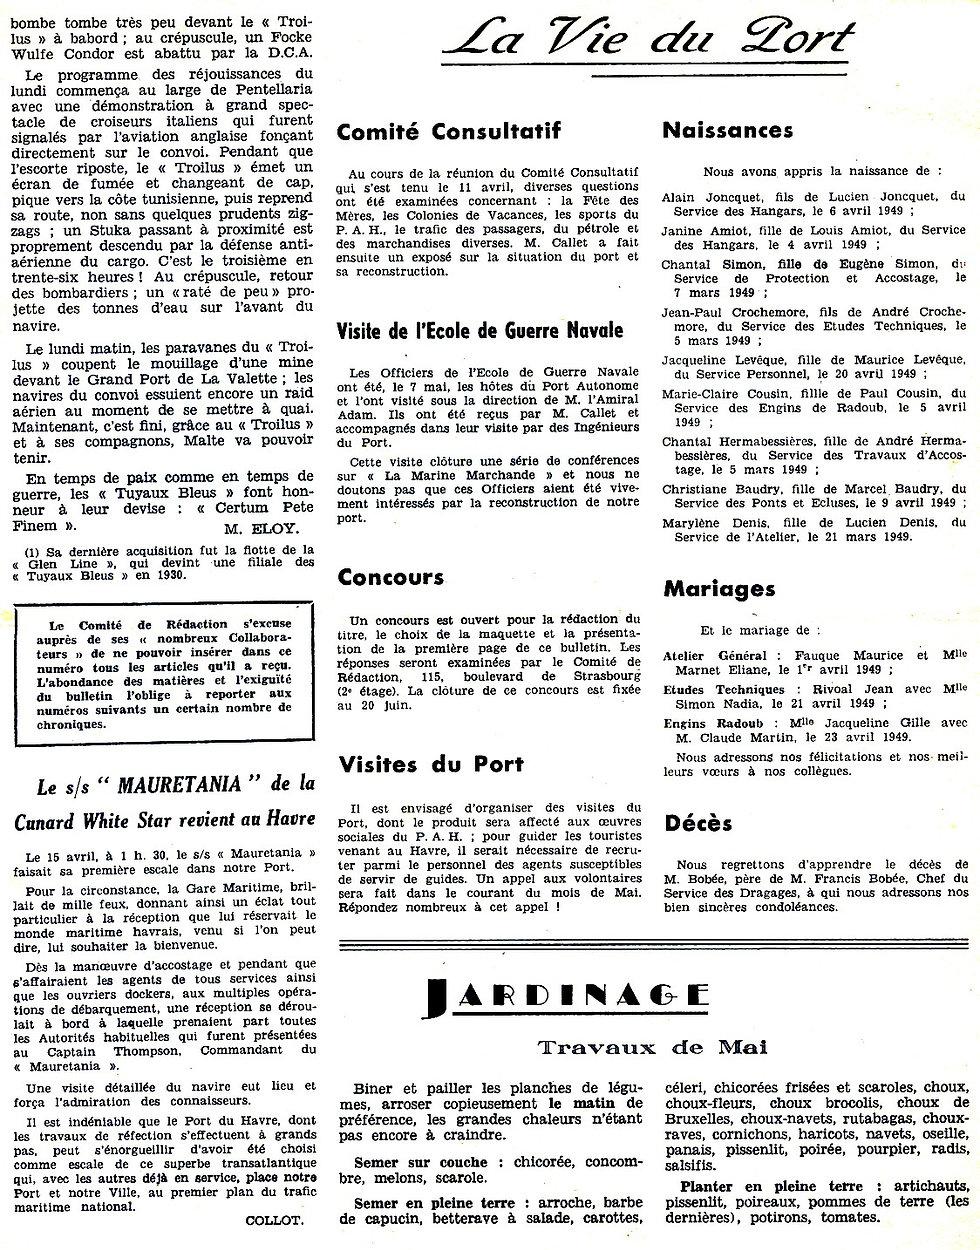 Mai 1949 4.jpg